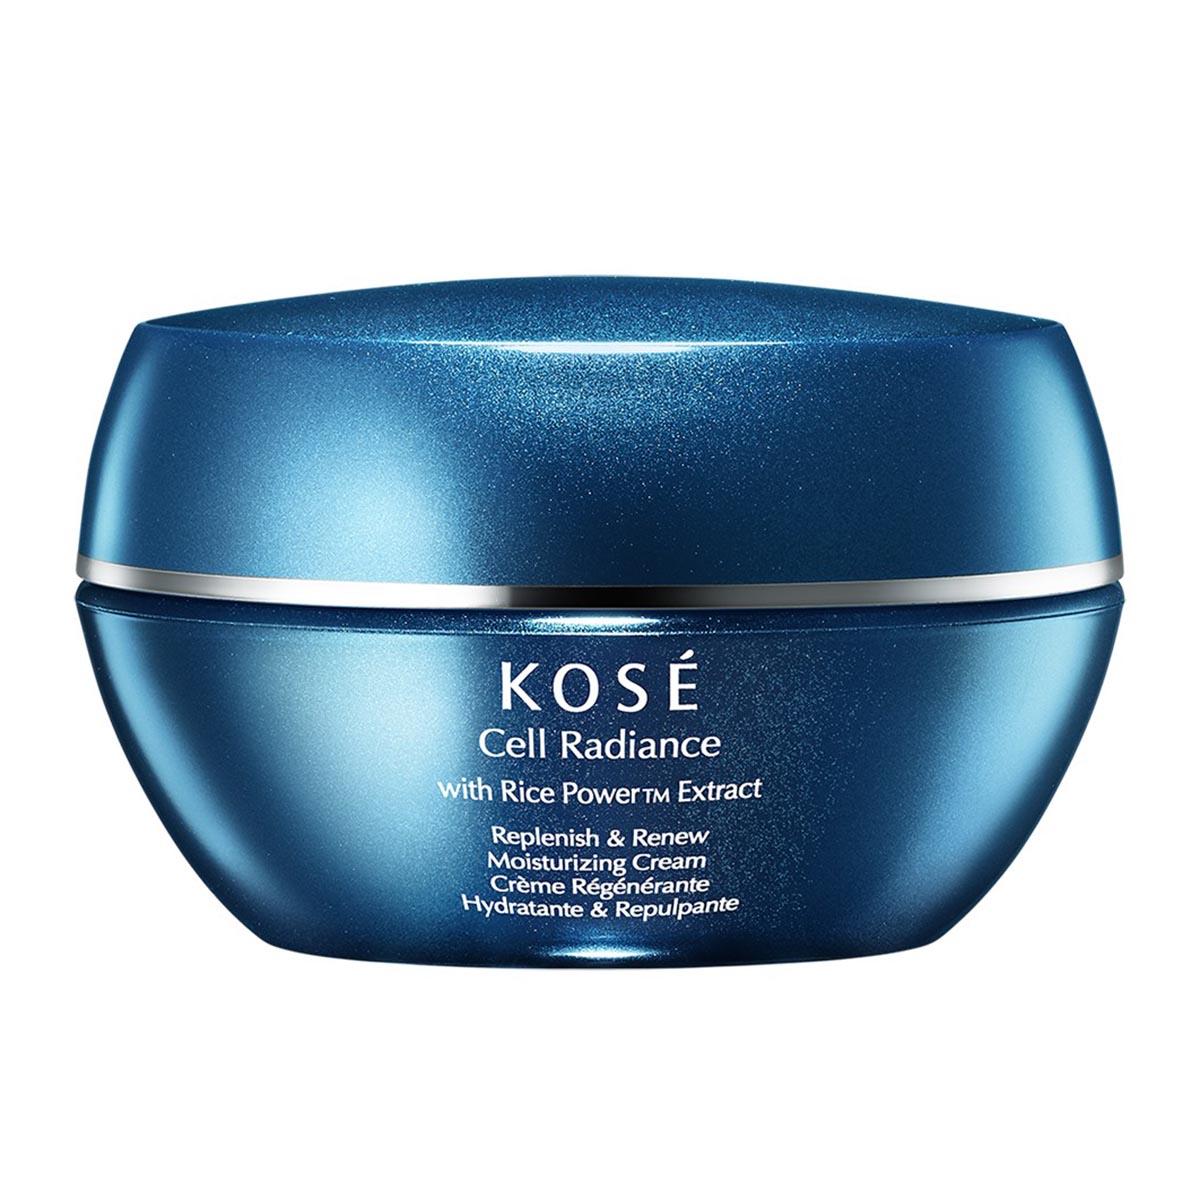 Kose cell radiance with rice power extract replenish renew moisturizing cream 40ml